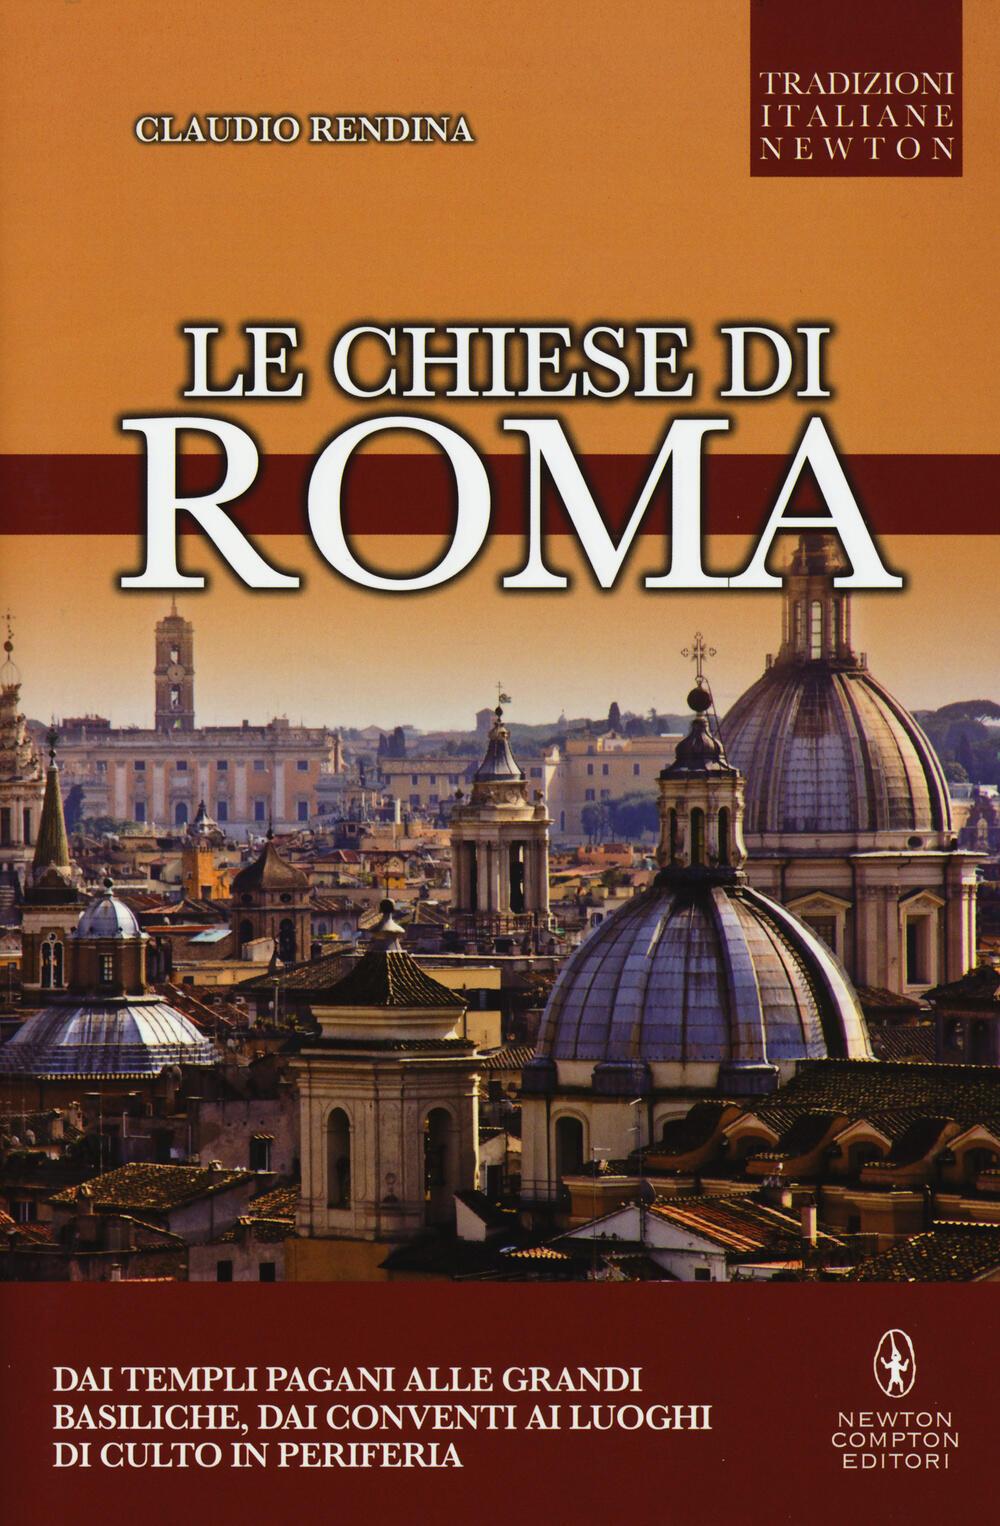 le chiese di roma claudio rendina libro newton